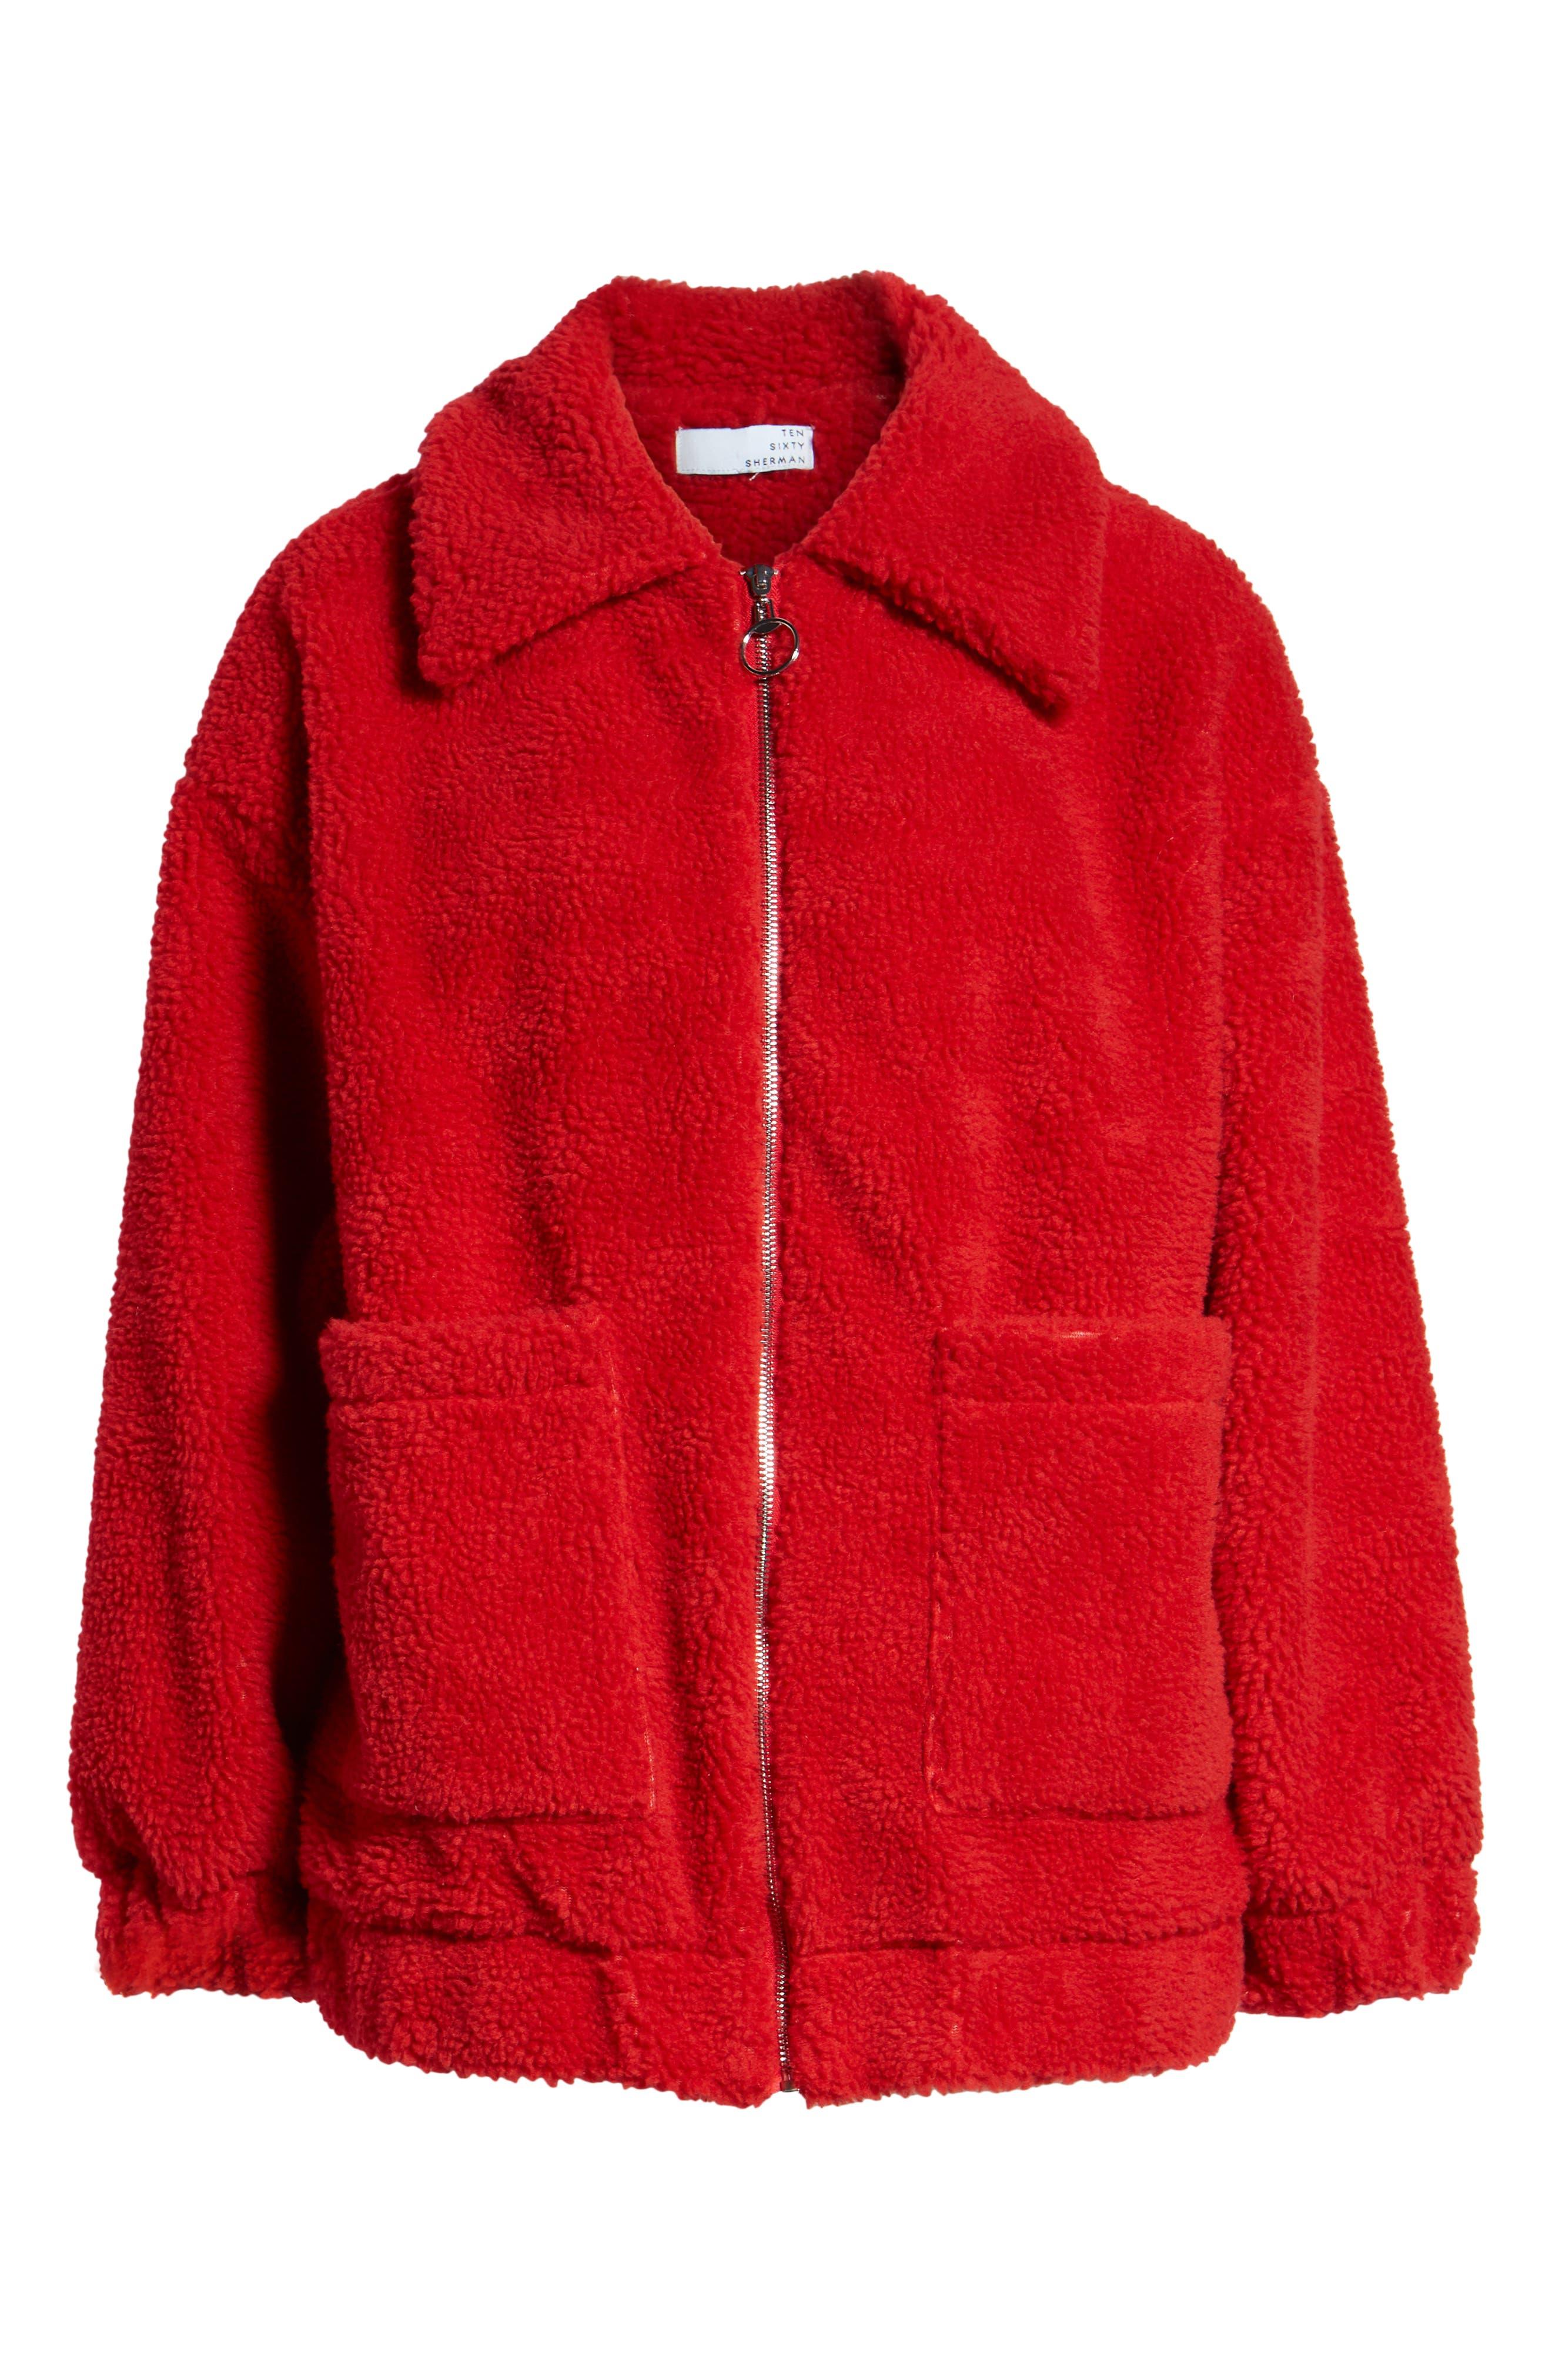 Oversized Fleece Jacket,                             Alternate thumbnail 6, color,                             RED